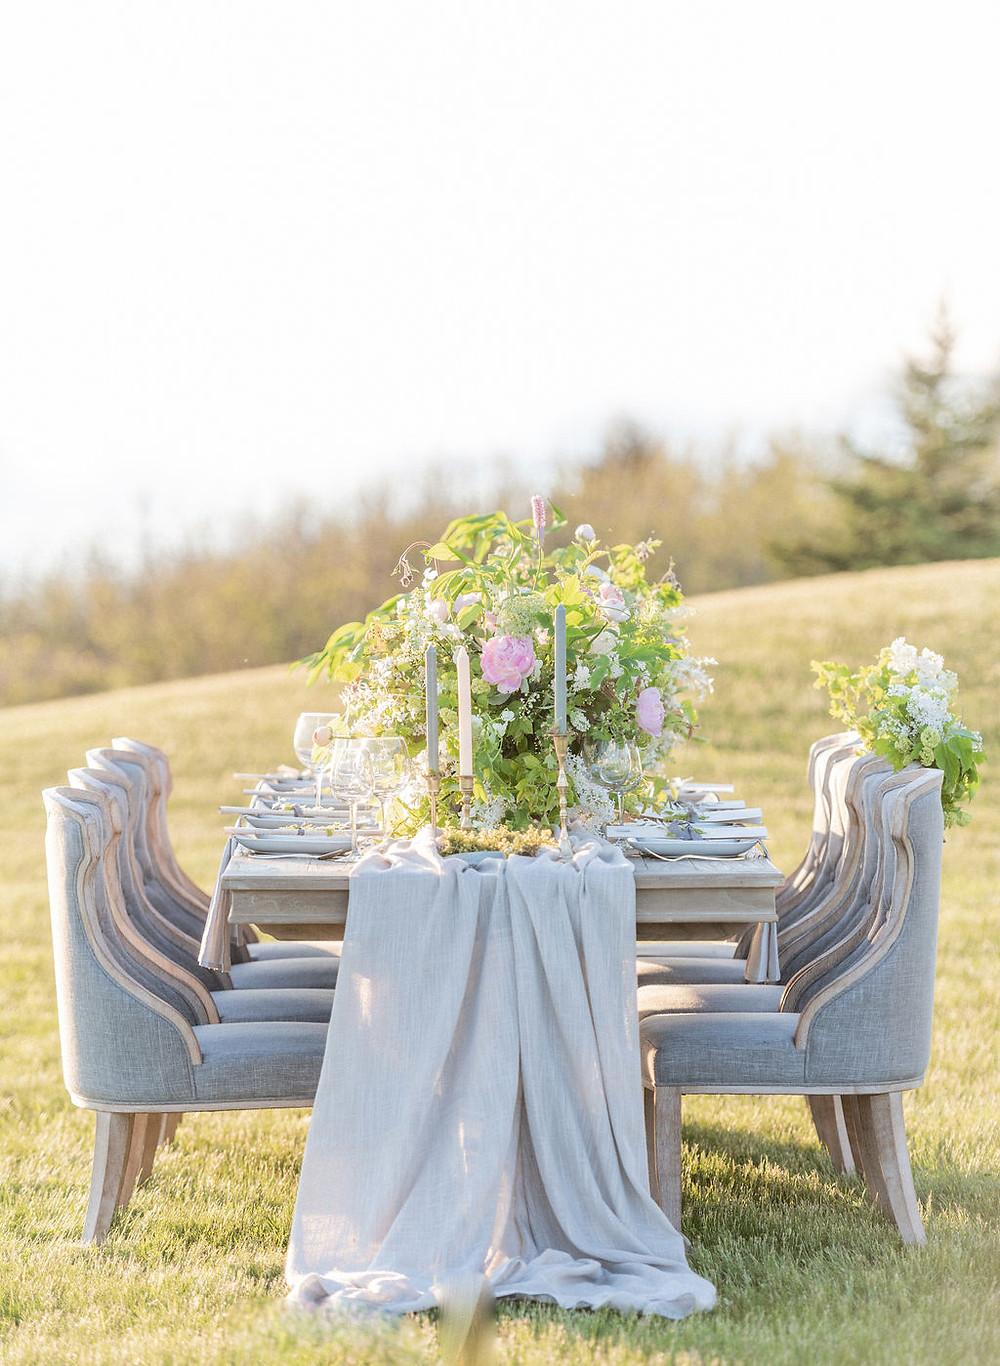 wedding table canada flowers decor